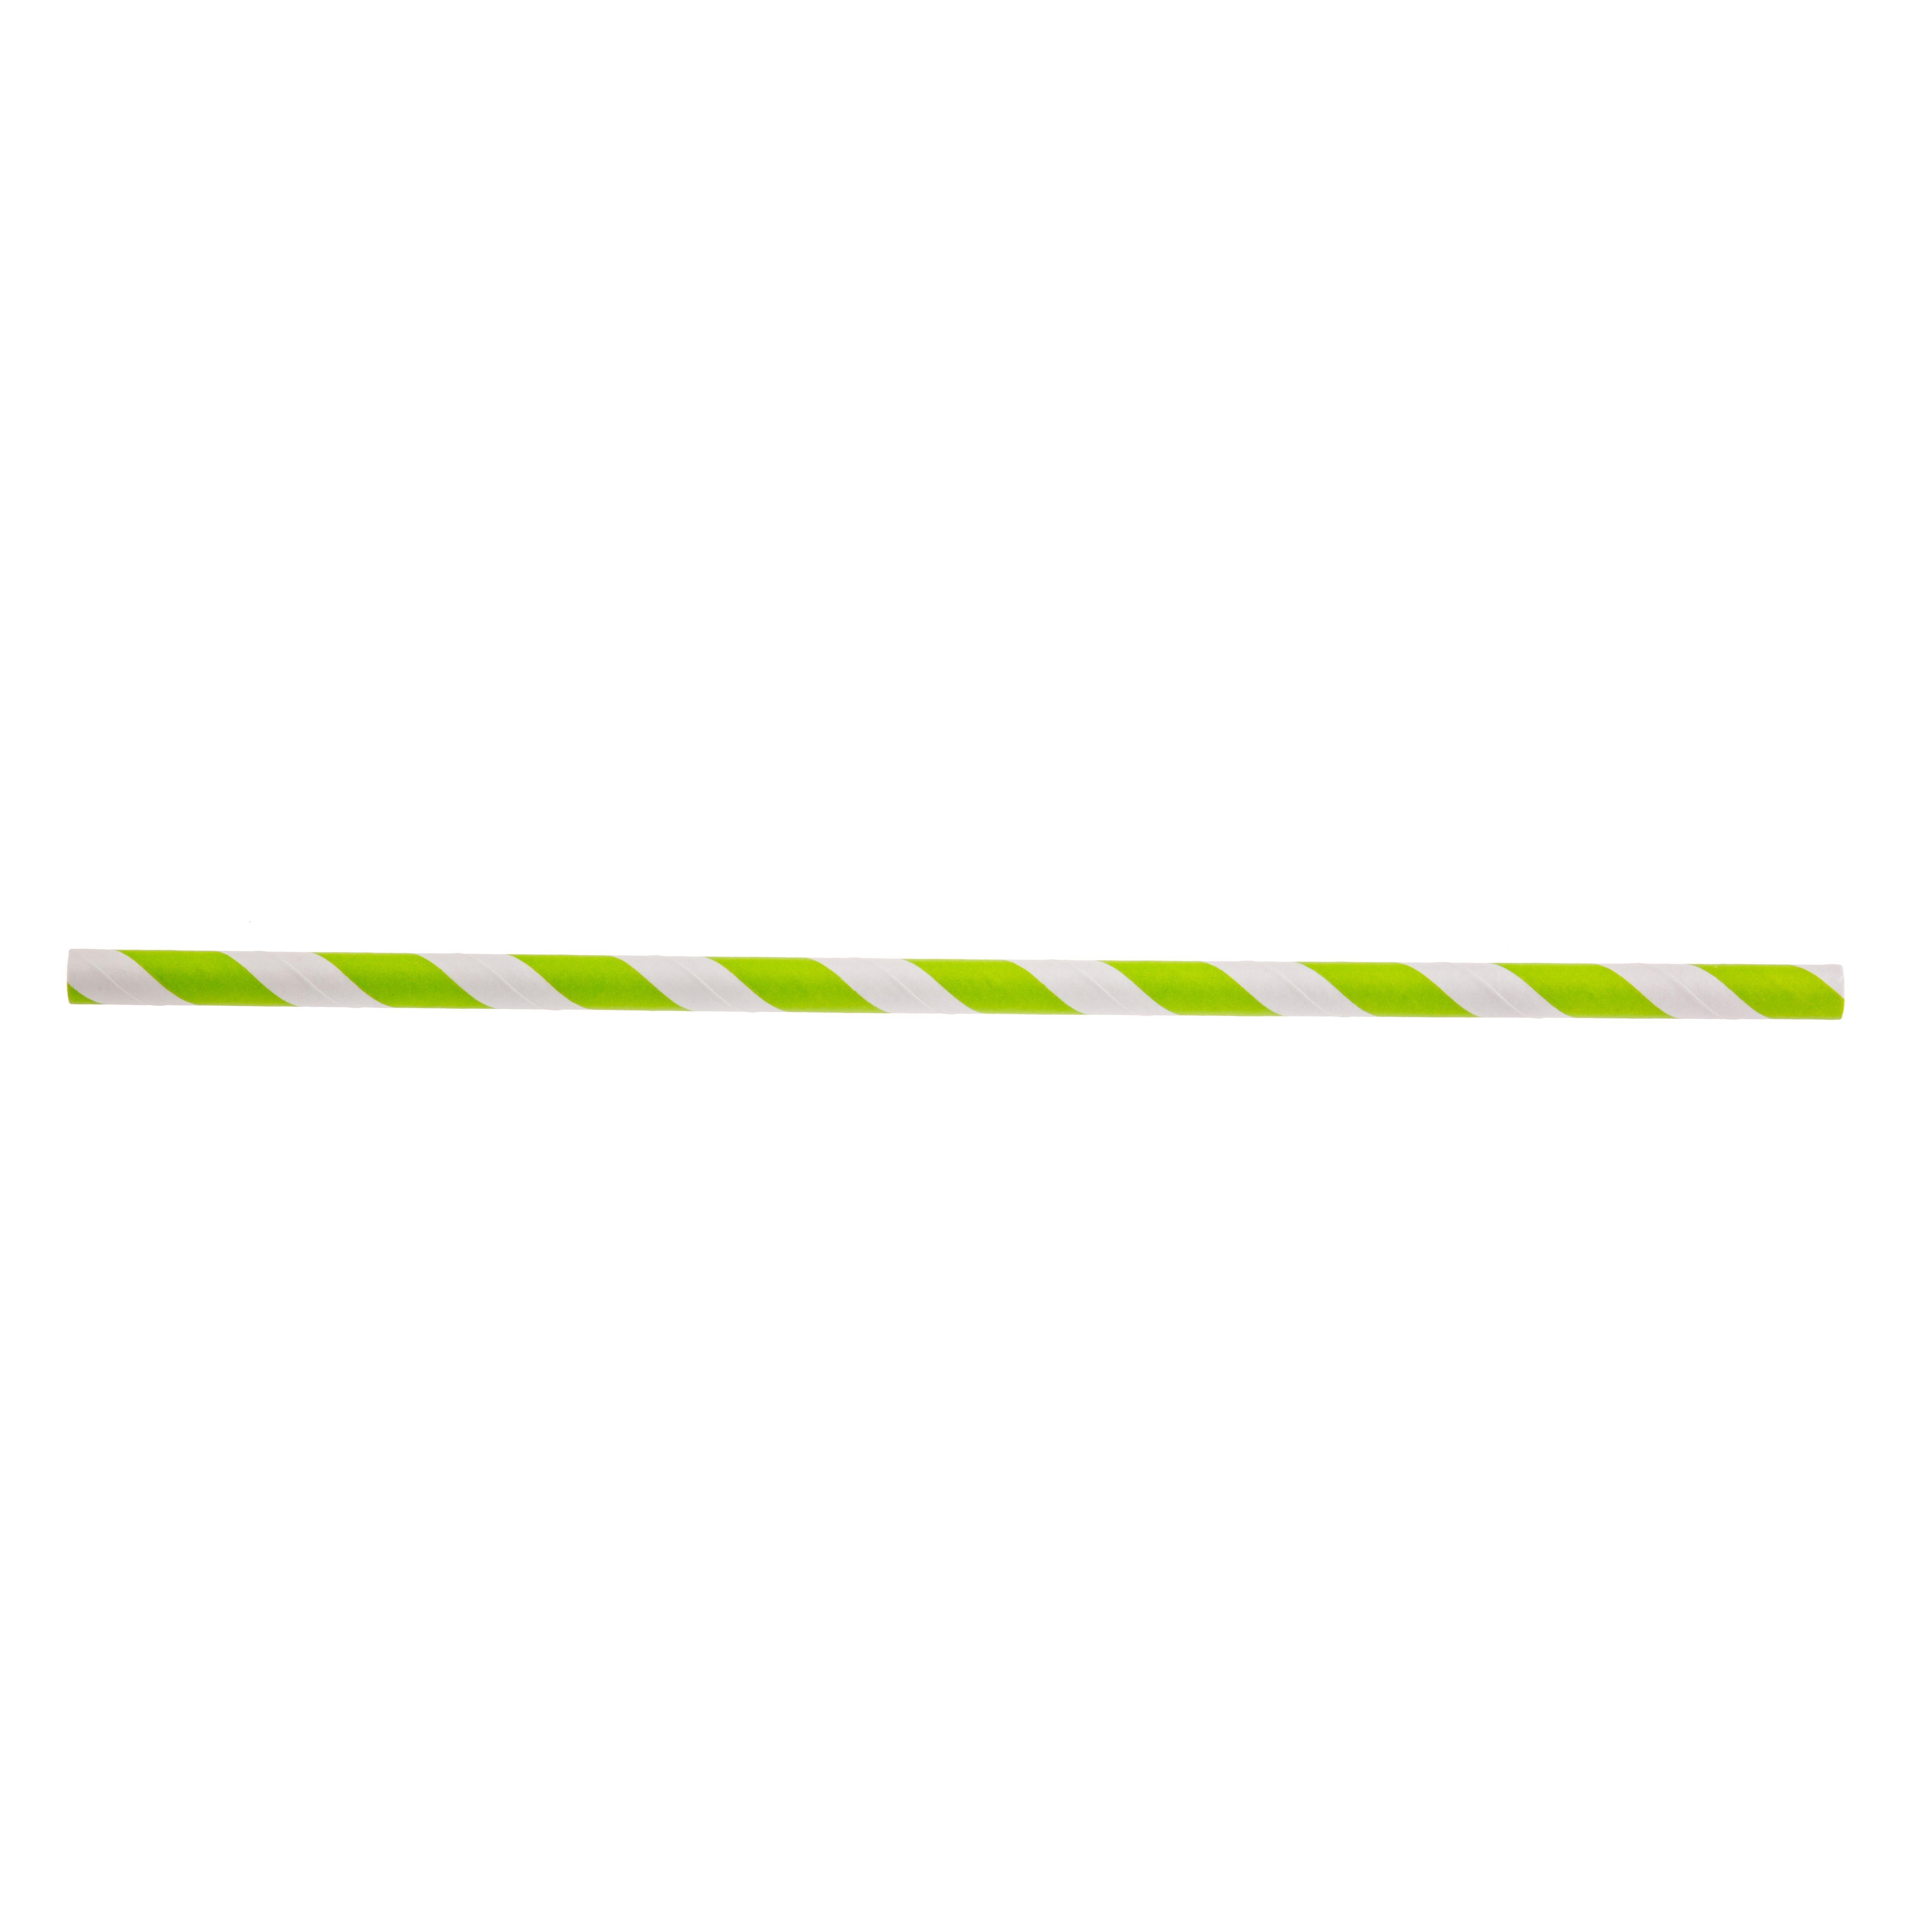 TableCraft Products 100118 straws